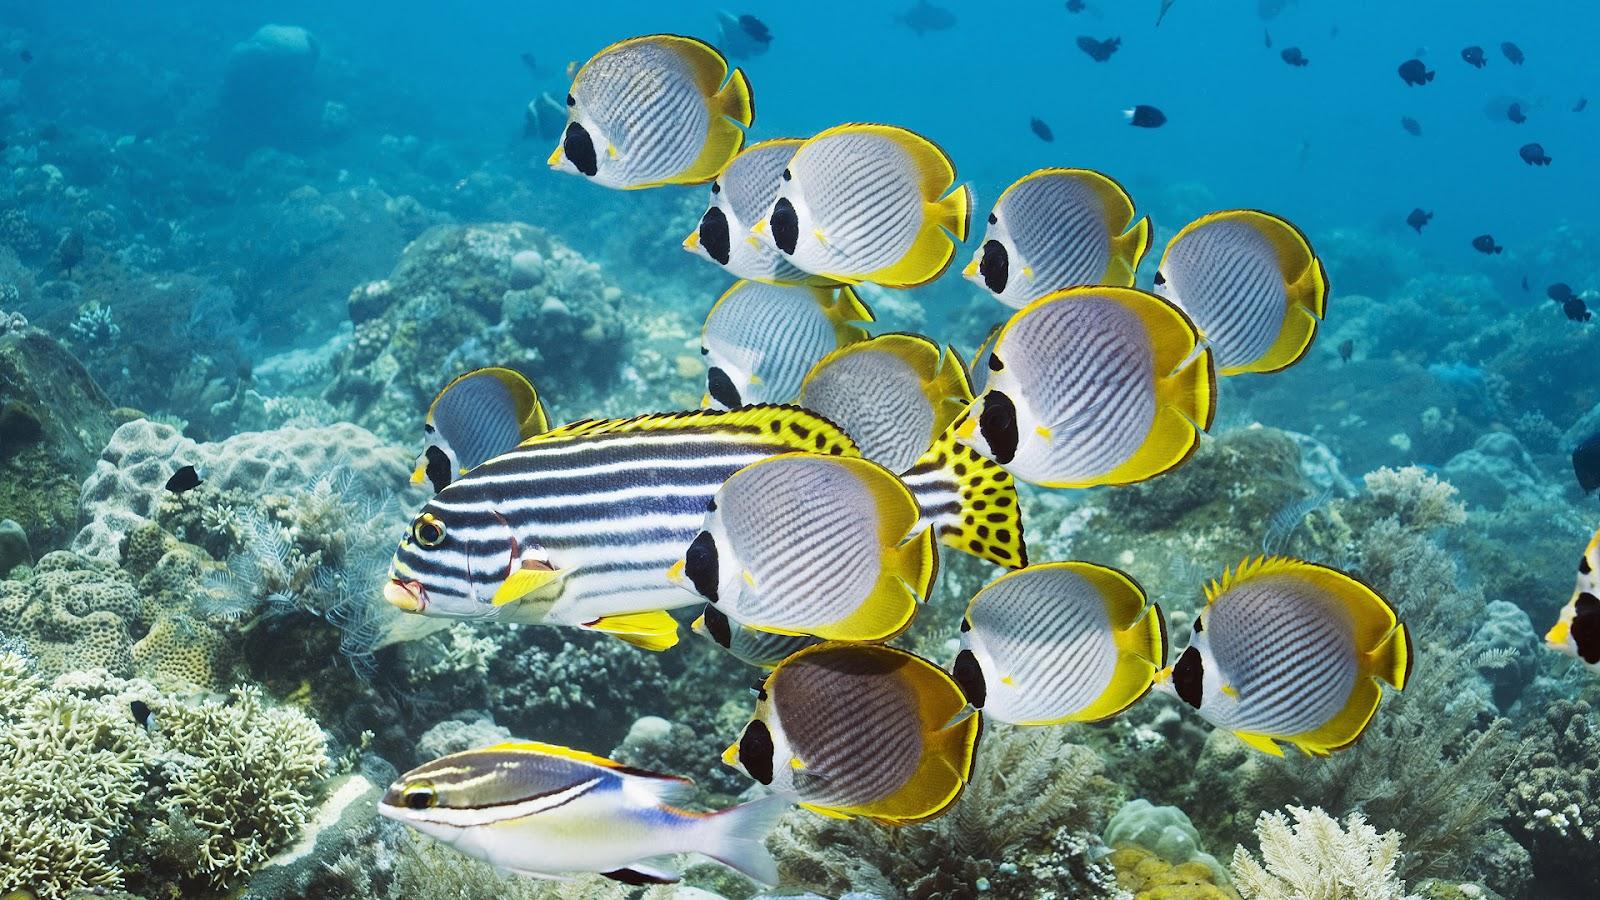 http://3.bp.blogspot.com/-j3SUrChOUQM/UC6LvDNEKlI/AAAAAAAAFPo/2xWxVcsTmKc/s1600/hd-vissen-wallpaper-met-onderwater-zwemmende-tropische-vissen-achtergrond-foto.jpg